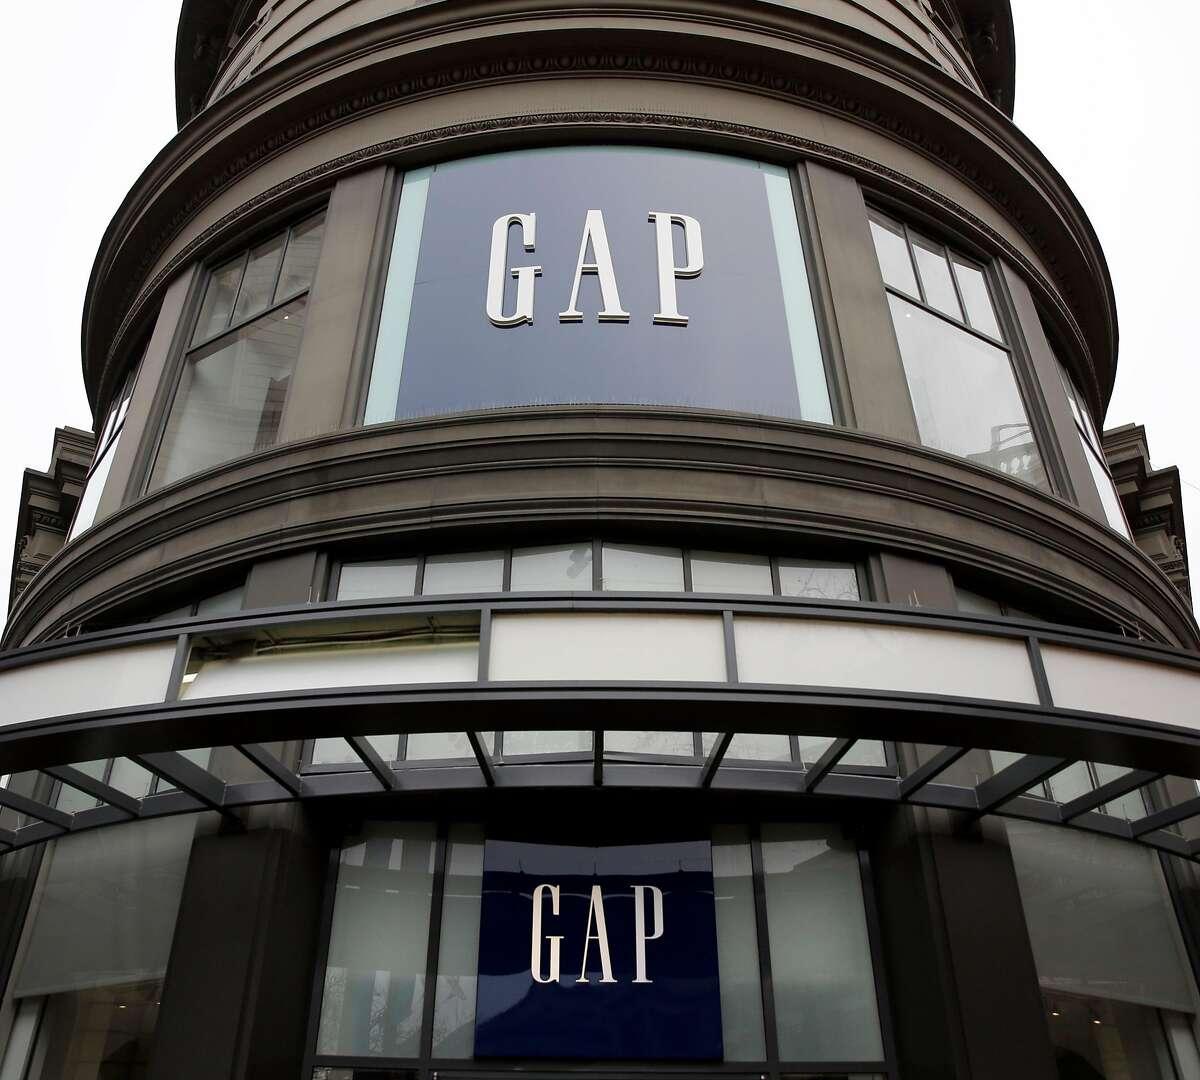 The Gap on Market Street in San Francisco, California, on Wednesday, Dec. 30, 2015.